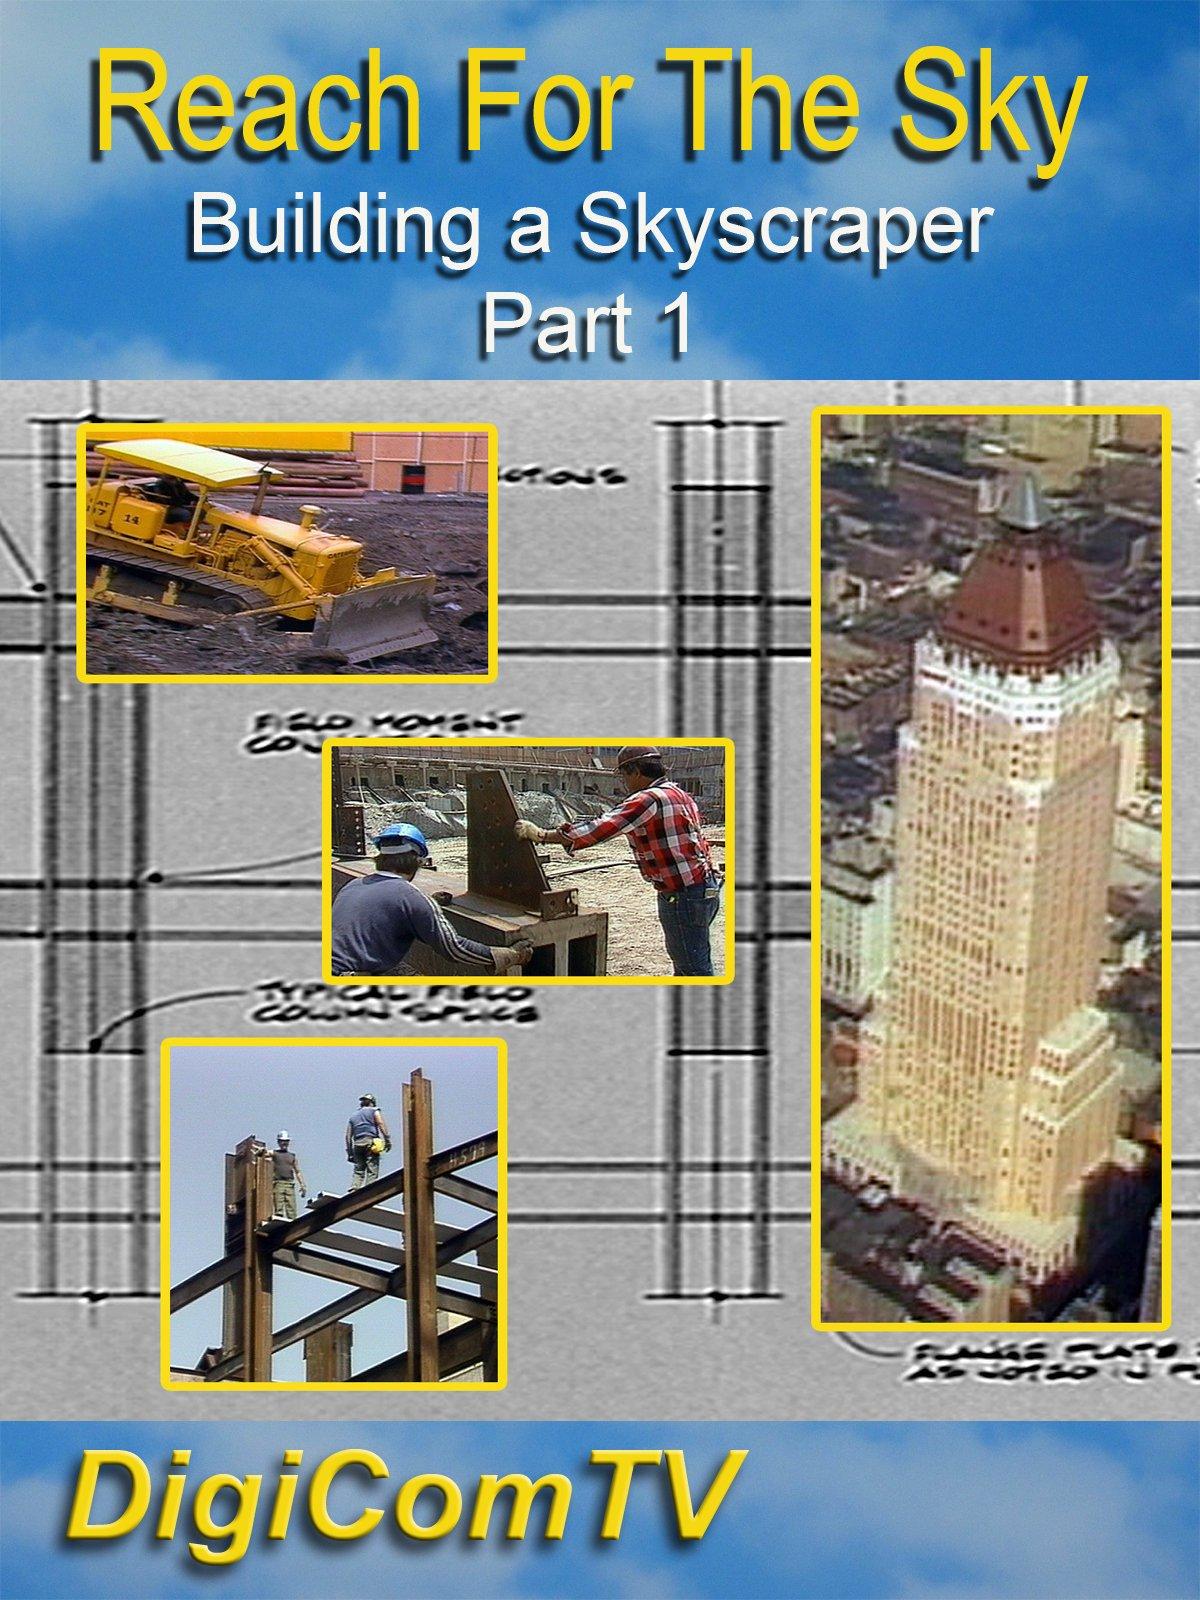 Watch Reach For The Sky - Building a Skyscraper - Part 1 | Prime Video